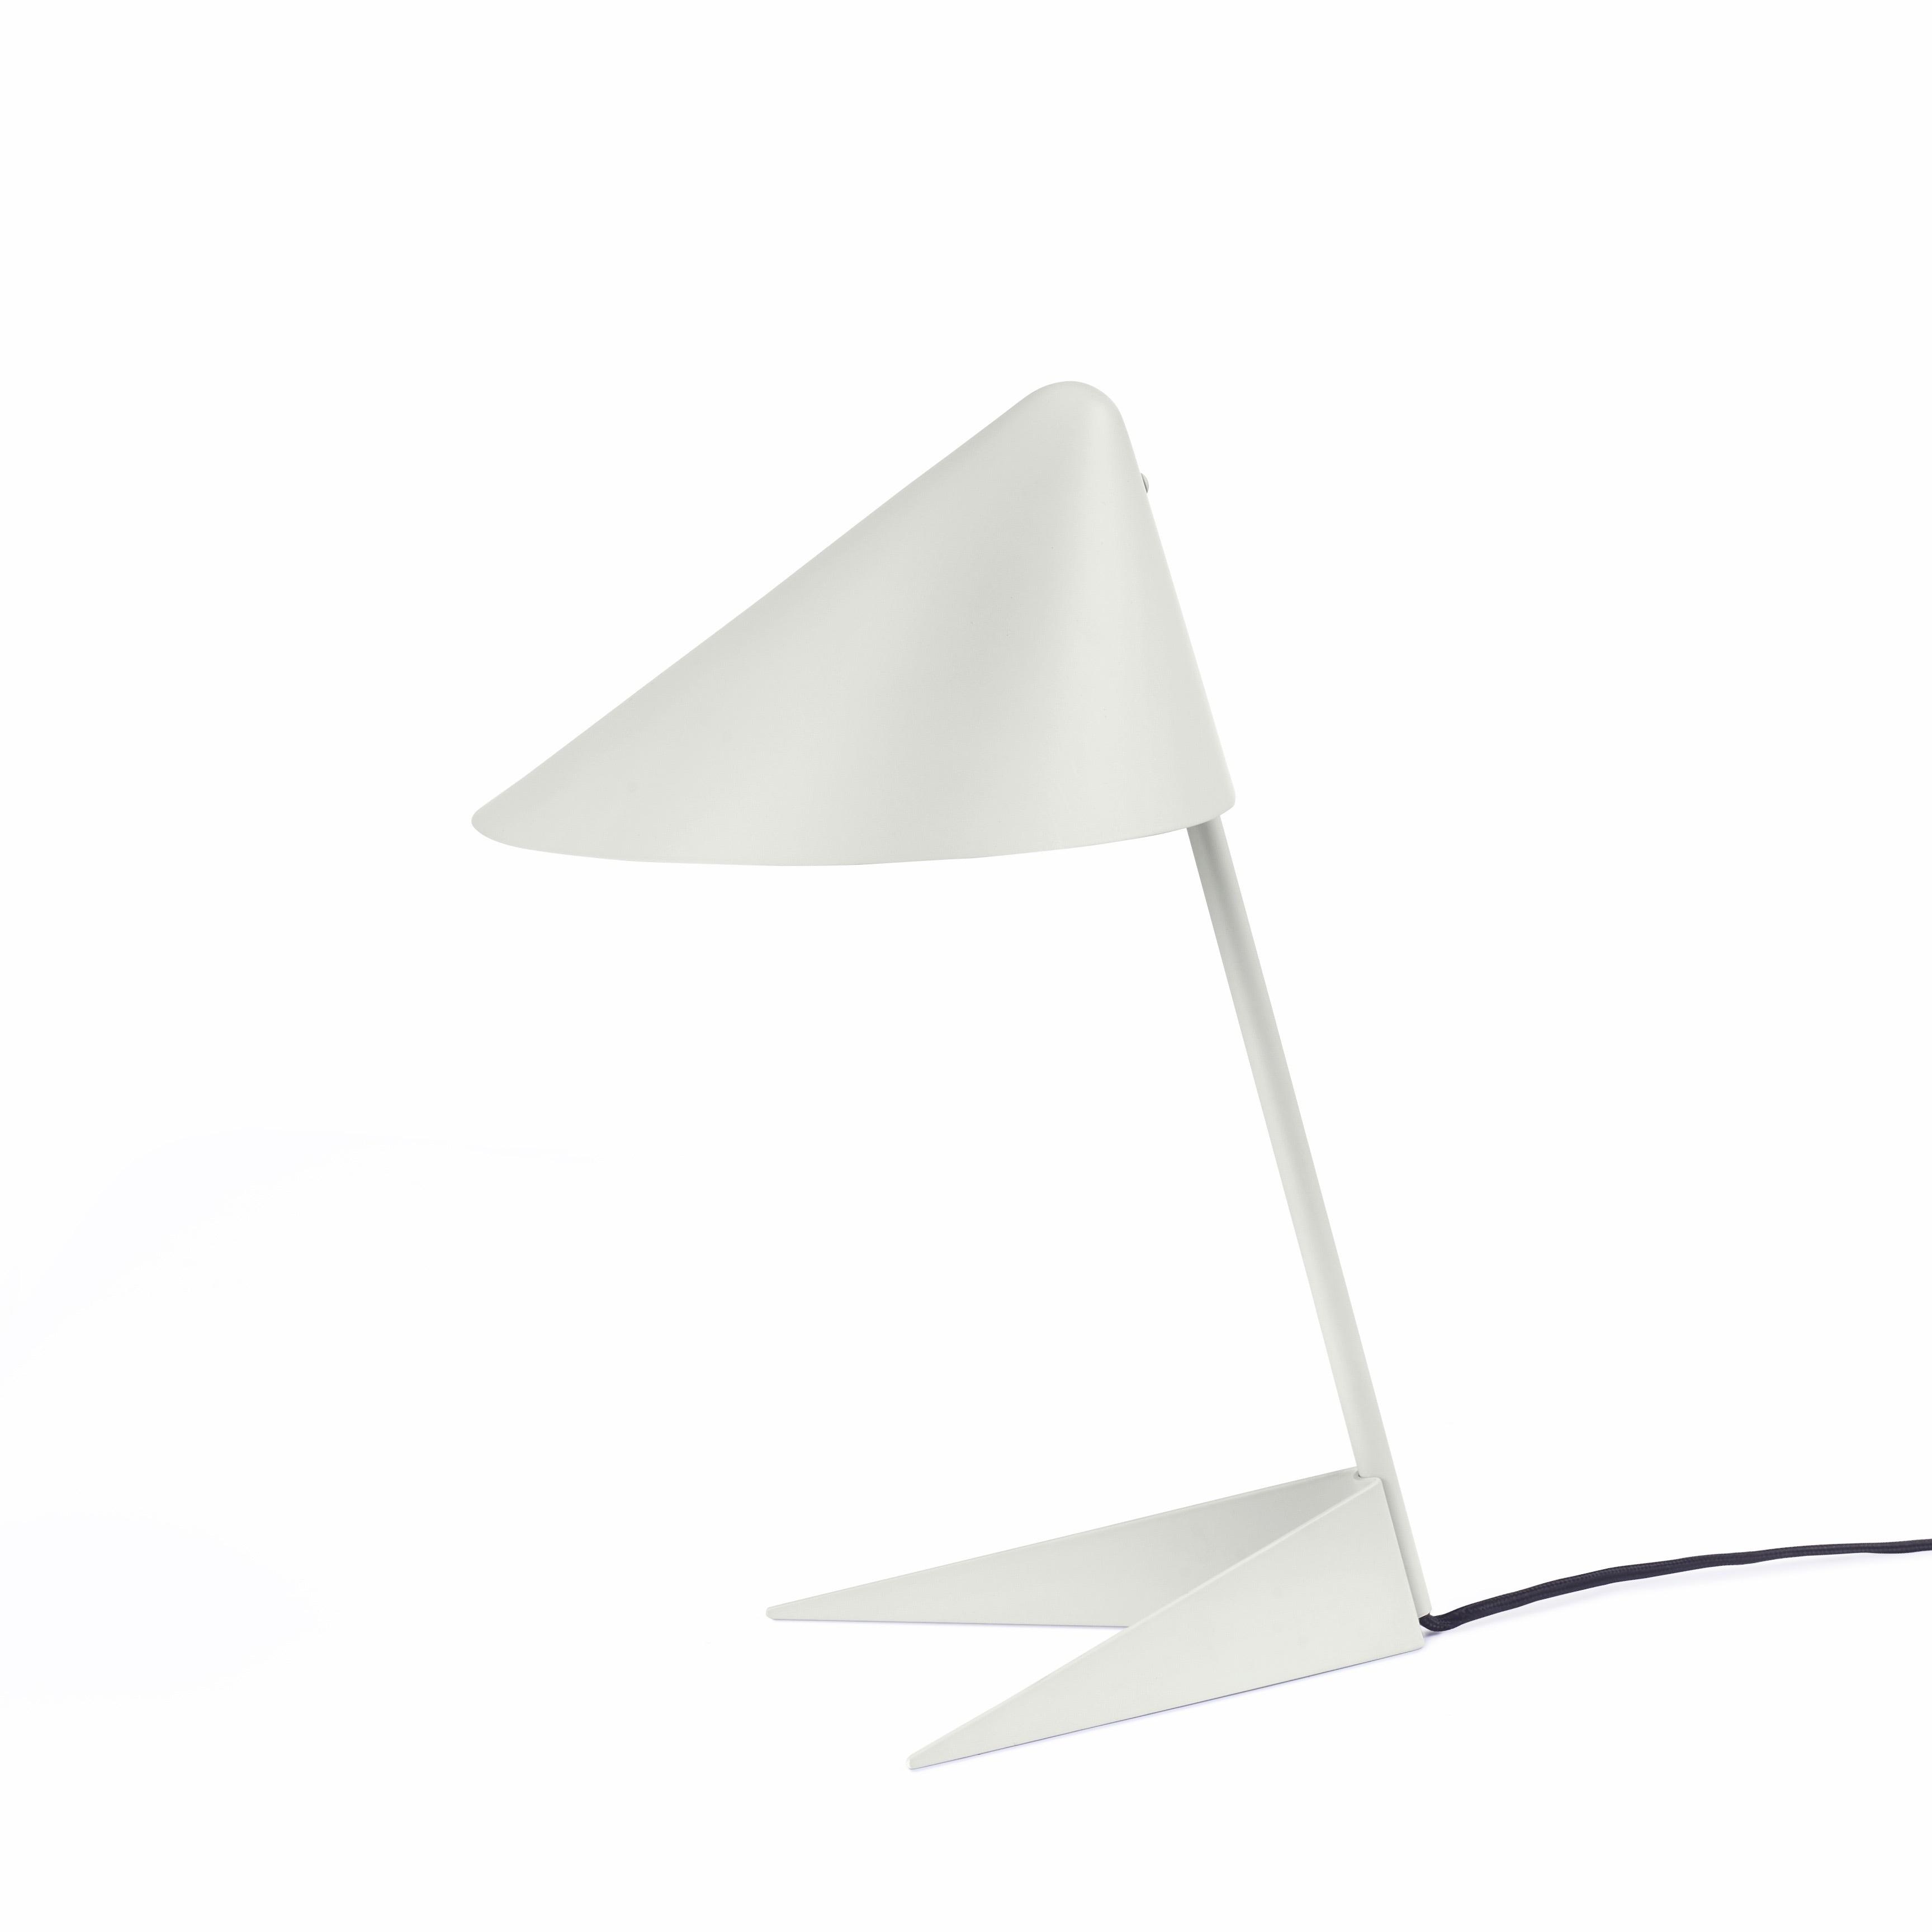 Ambience bordslampa warm white